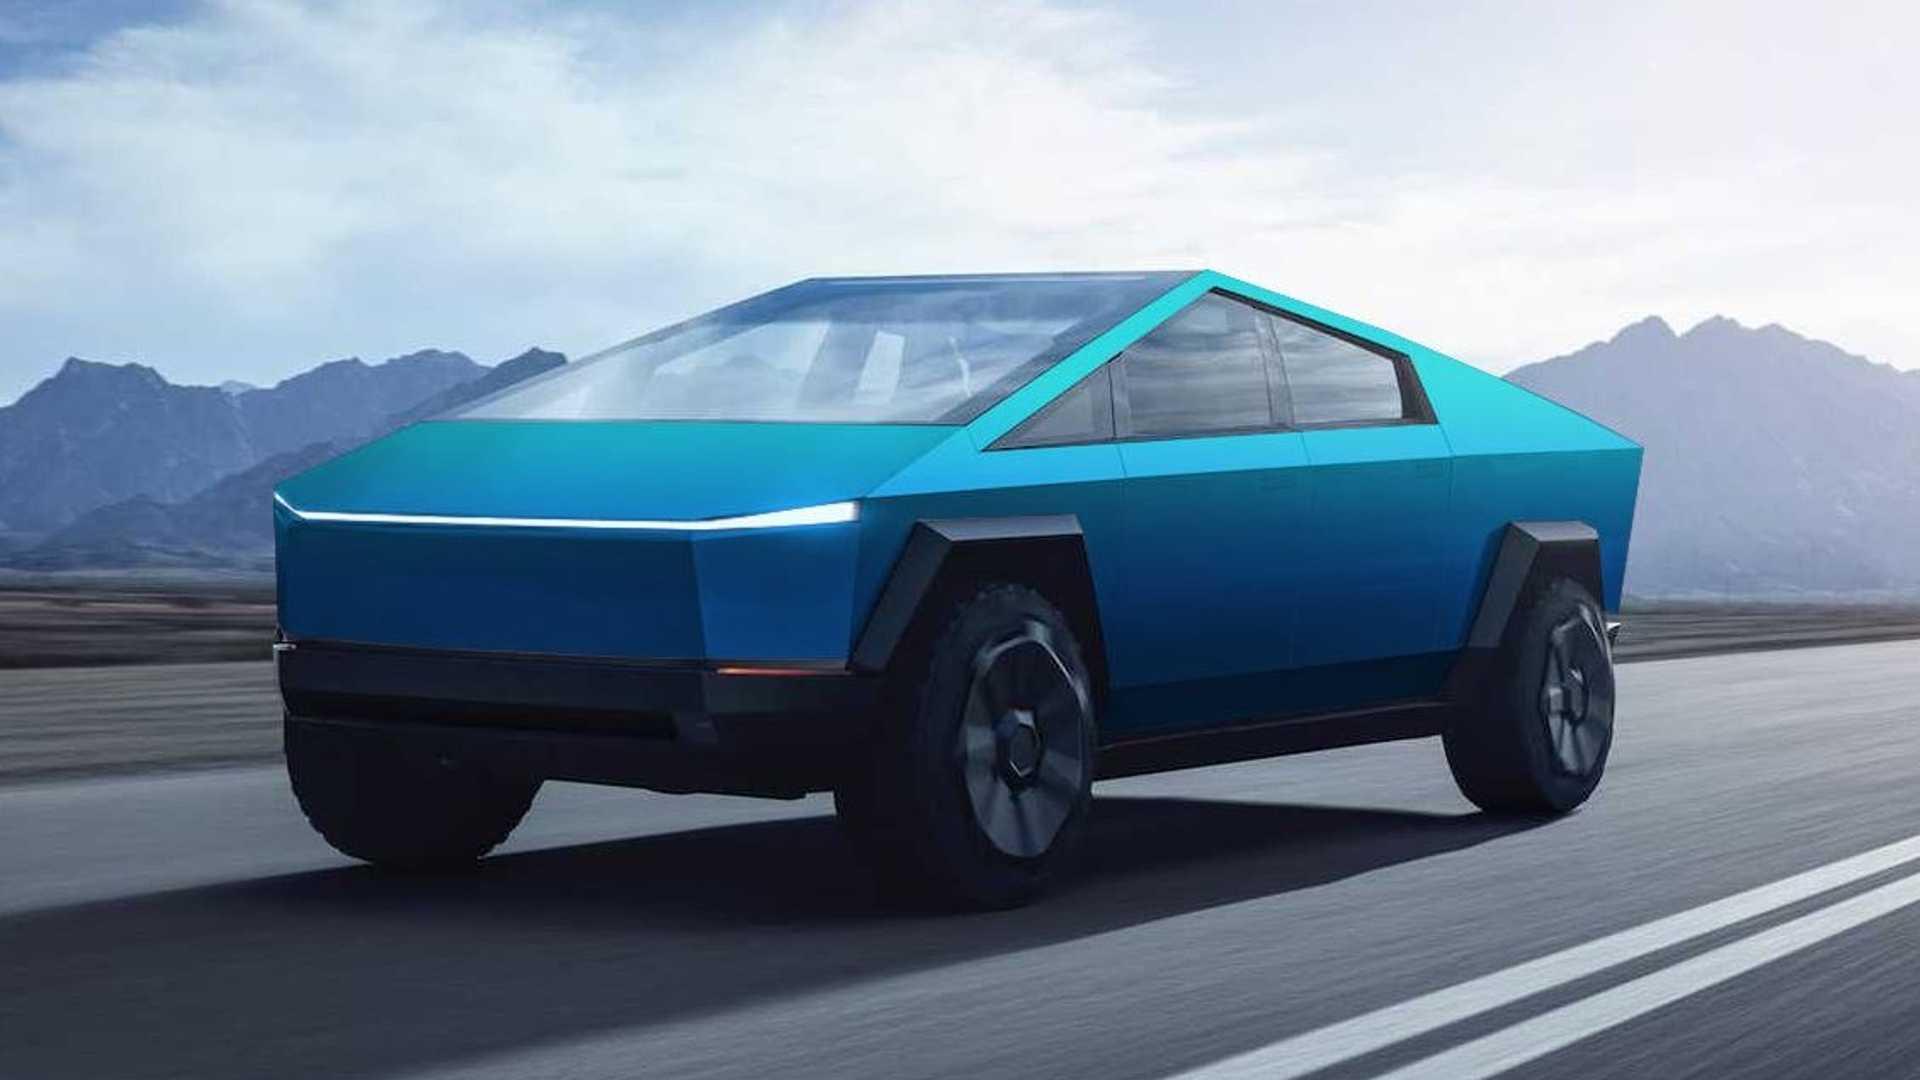 Concept Image of Tesla Cybertruck